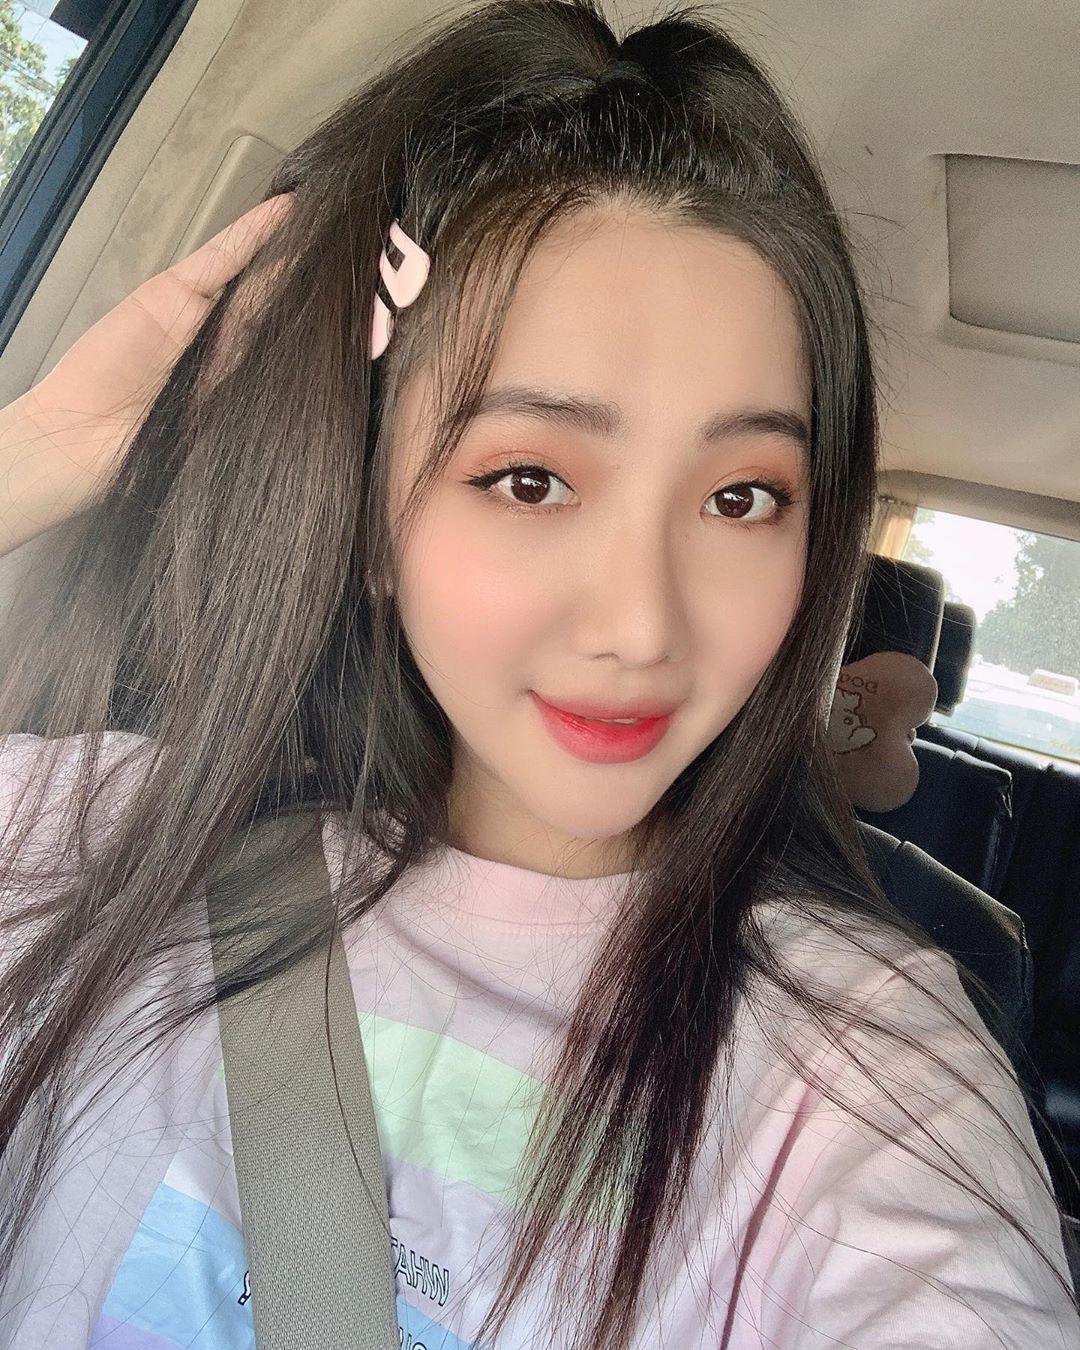 Hsu Eaint San Black Hairstyle For Girls, Beautiful And Cute Girls, Lip Makeup